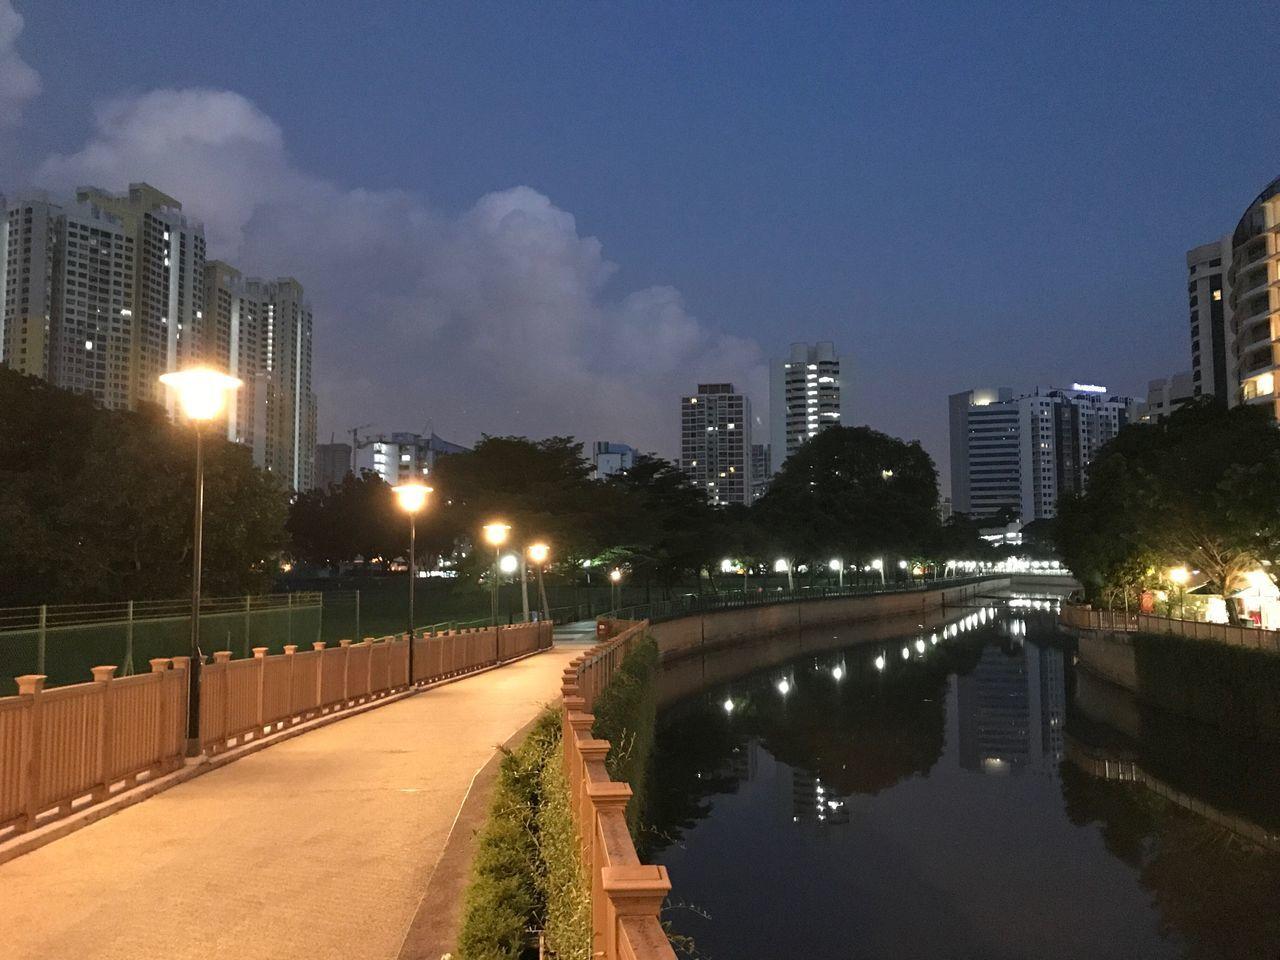 Good Morning Singapore 2 - Dawn - Riverside No People Street Light Waterfront River River Walk Riverside Day Breaks Softly Day Break Skyline